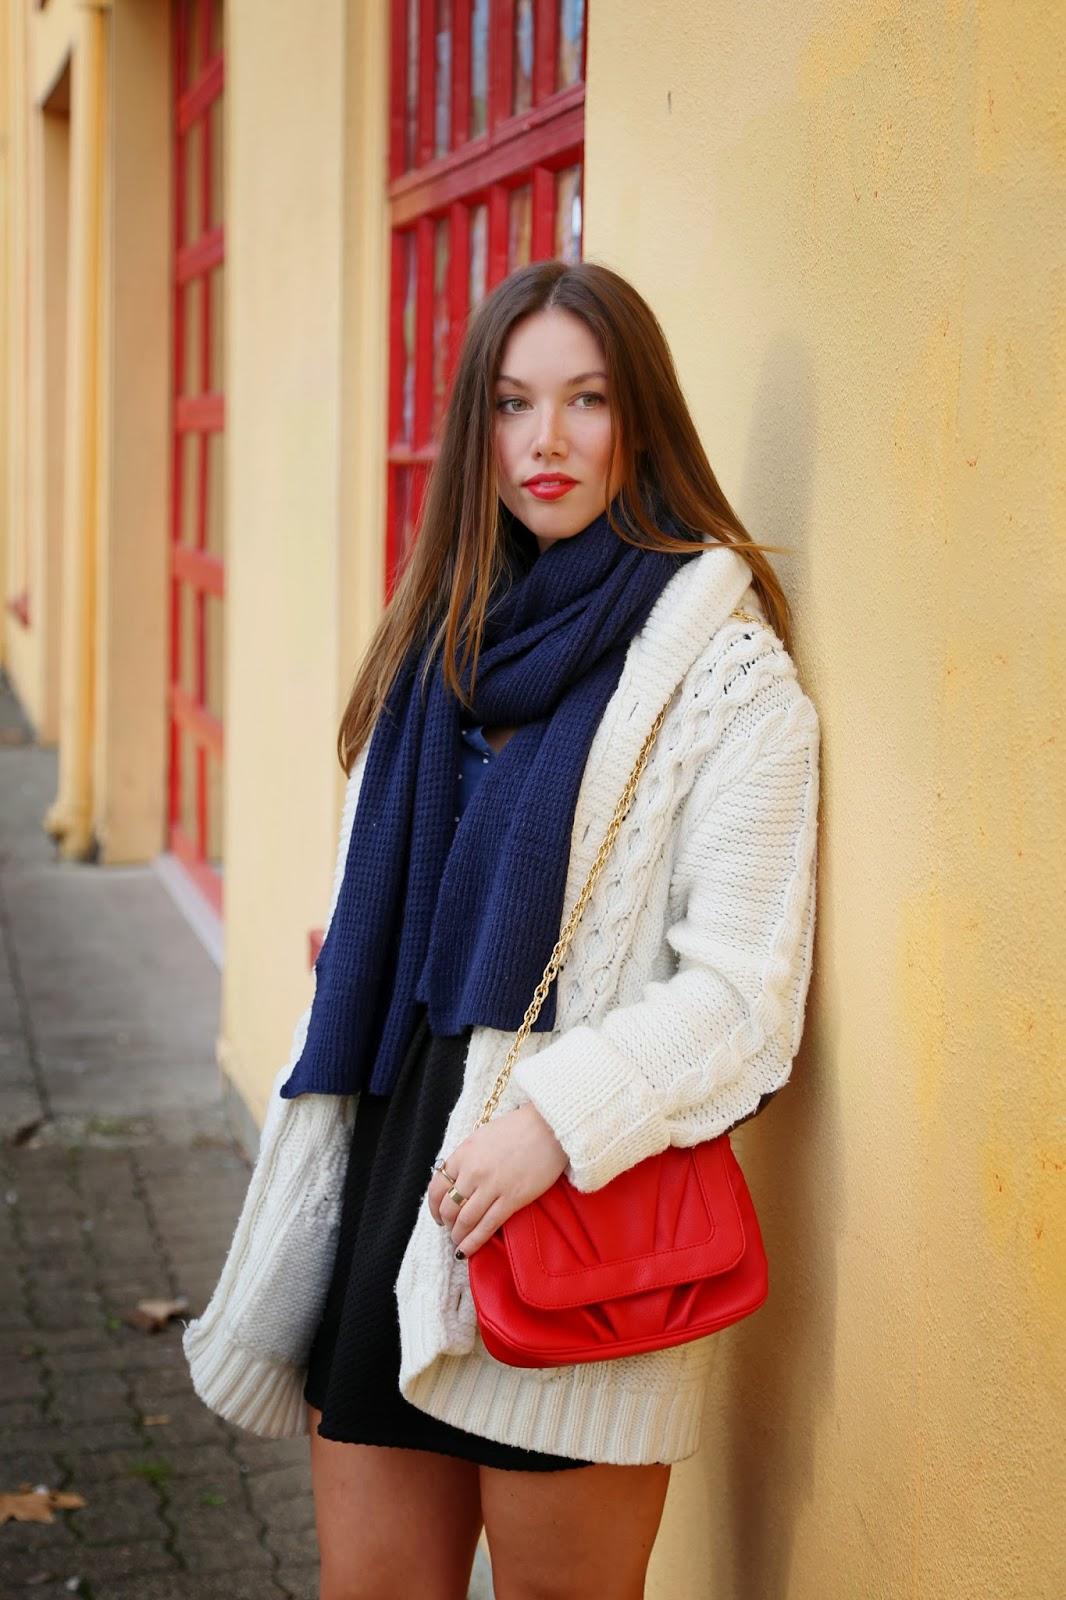 to vogue or bust, vancouver style blog, vancouver fashion blog, alexandra grant, canadian fashion blog, fall fashion, fall style, vancouver blog, h&m men's cardigan, mary nichols bag, h&m skirt, zara dotted blouse, joe fresh scarf, zara booties, fashion magazine style panel